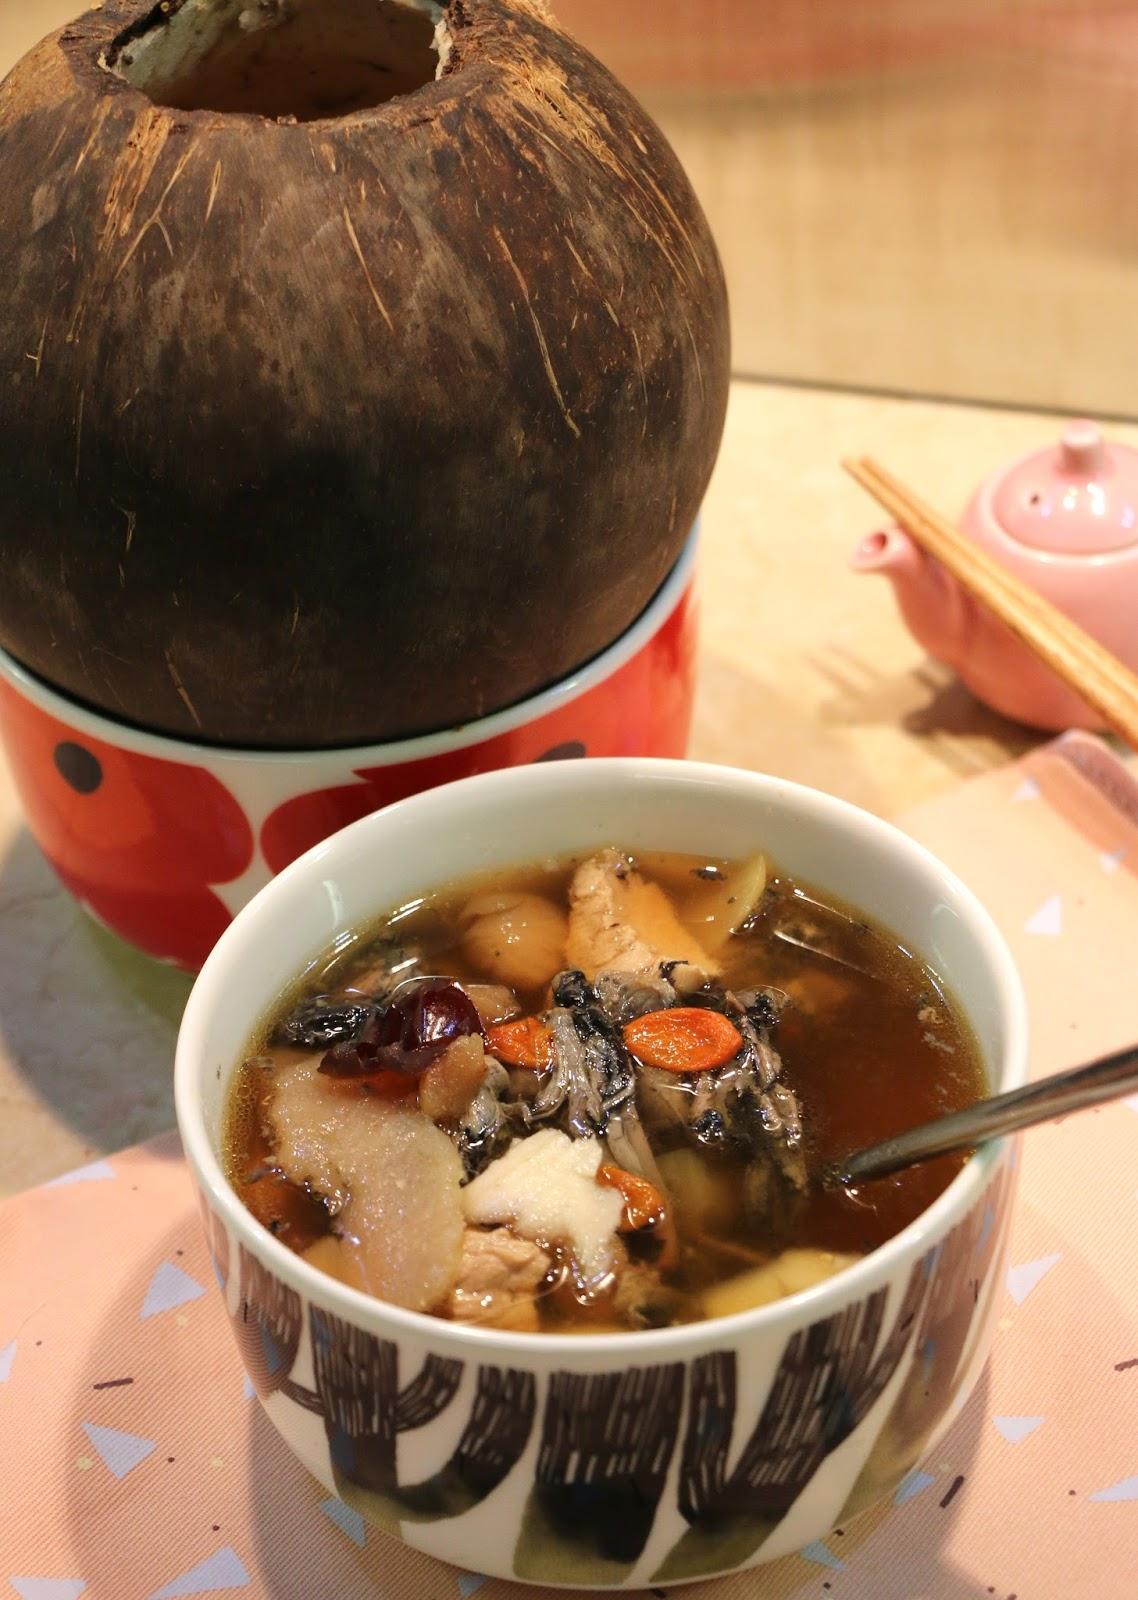 Fen's Cooking: 原個椰子燉烏雞湯